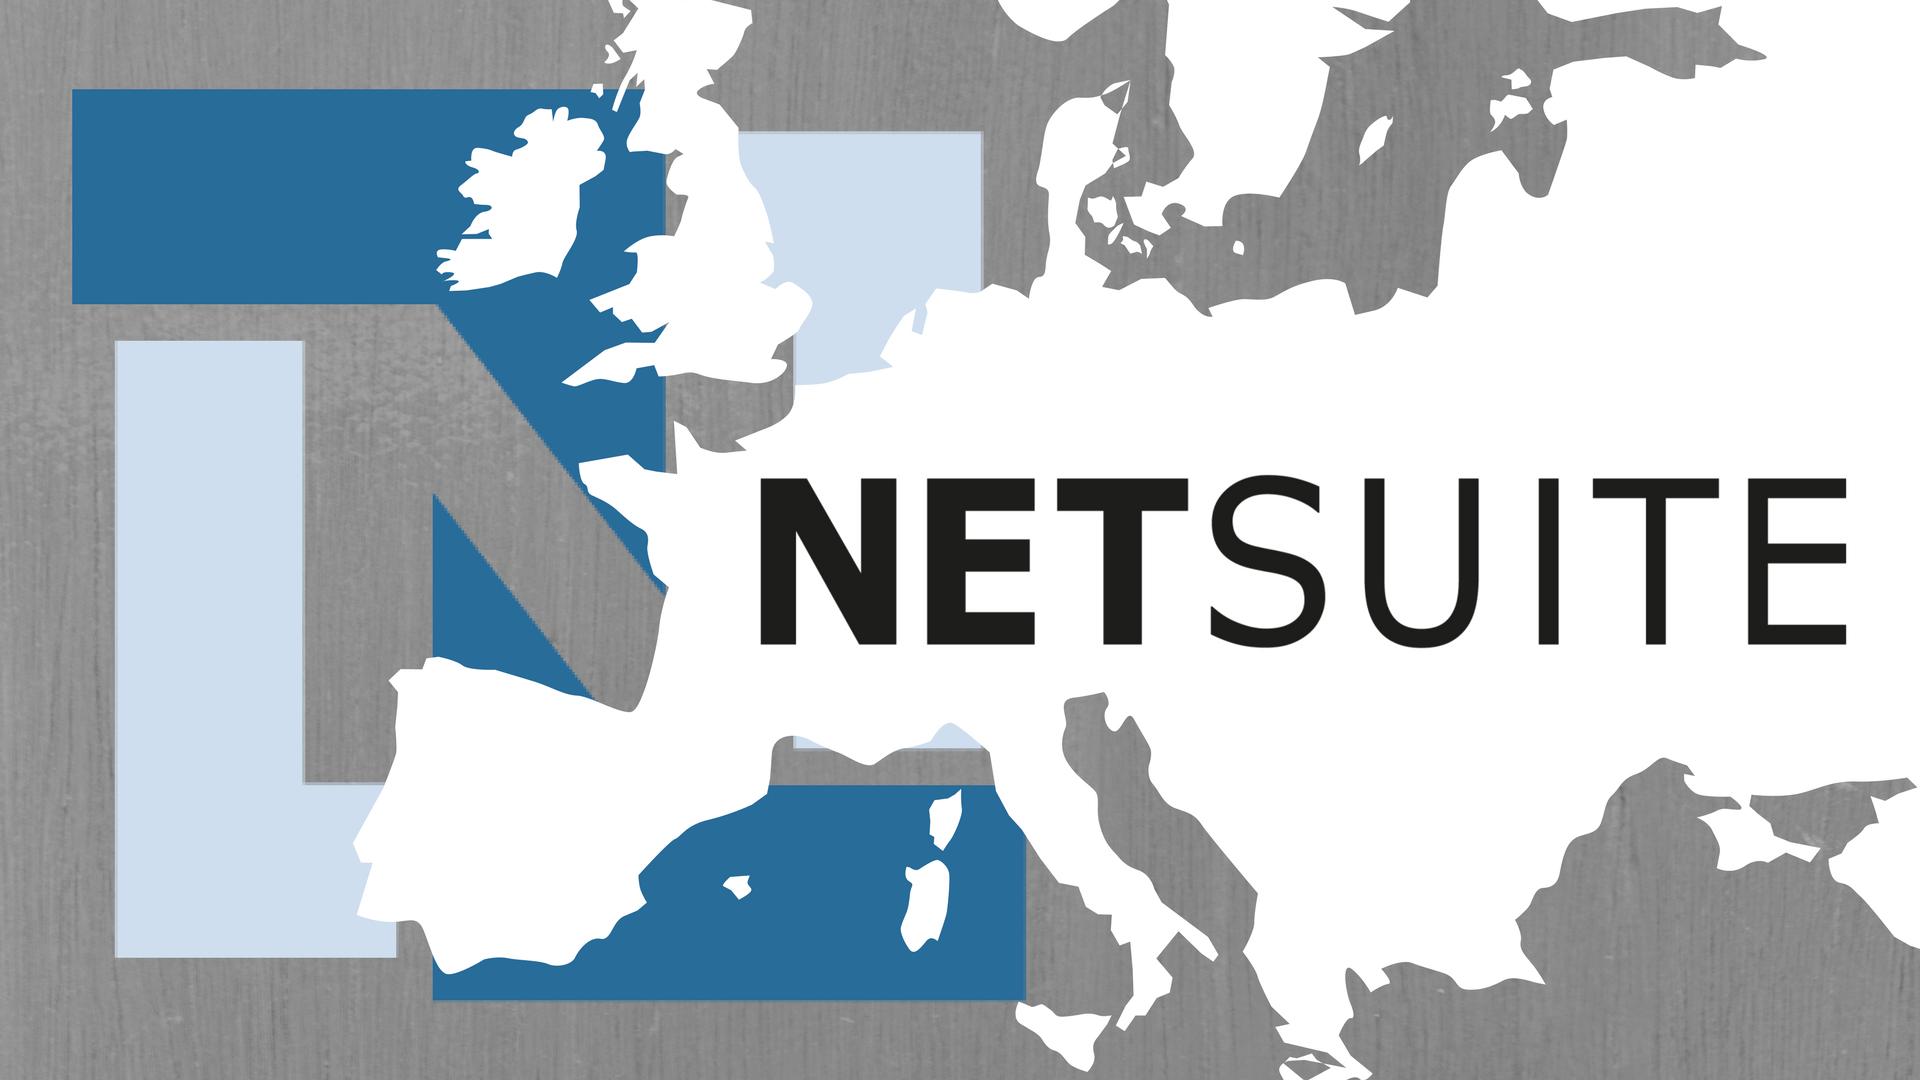 Oracle-NetSuite accelera la sua espansione nell'area EMEA